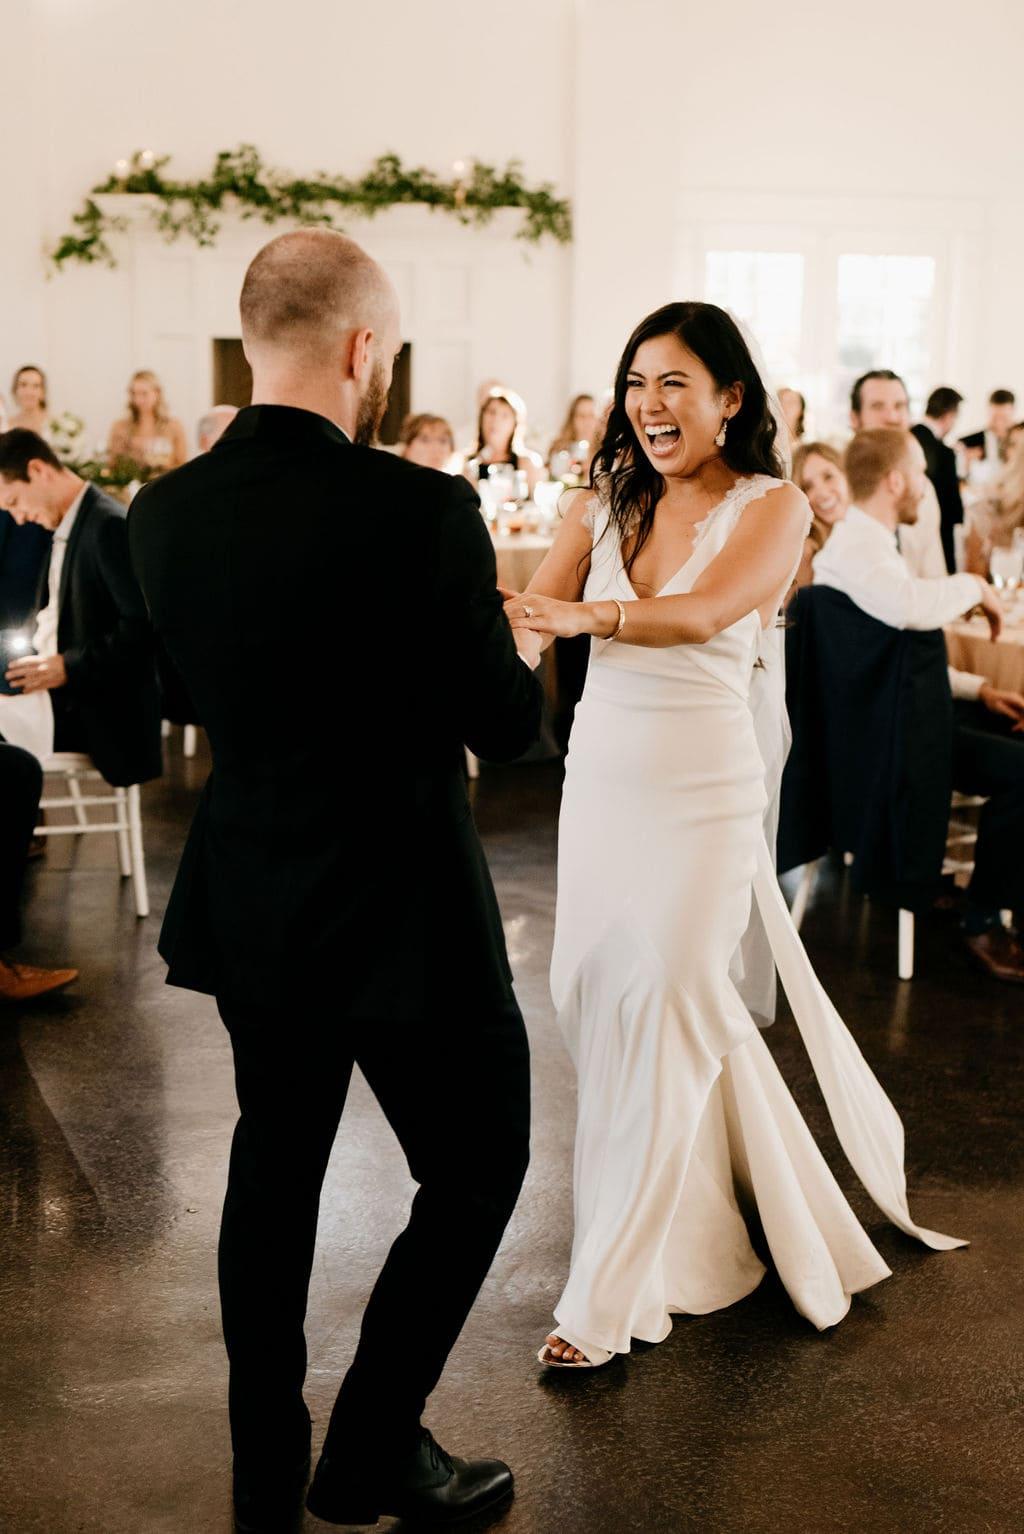 Classy first dance